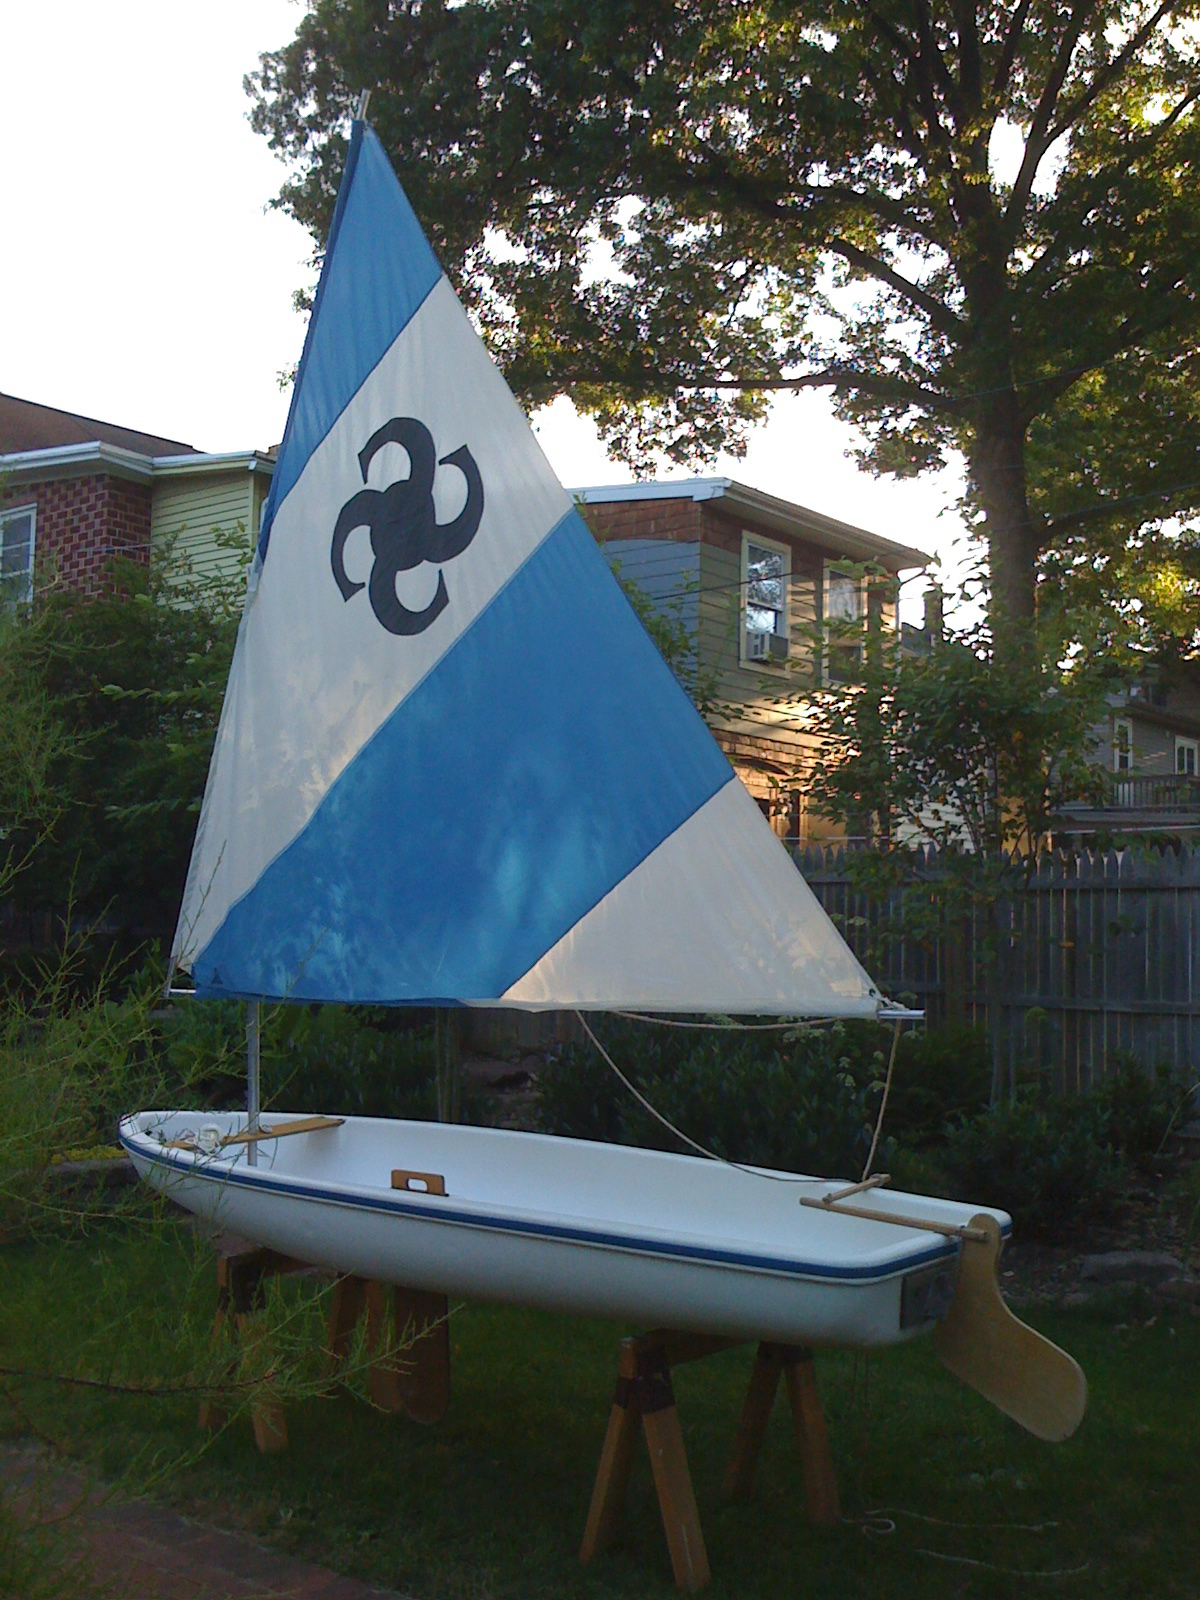 Snark sailboat - Wikipedia